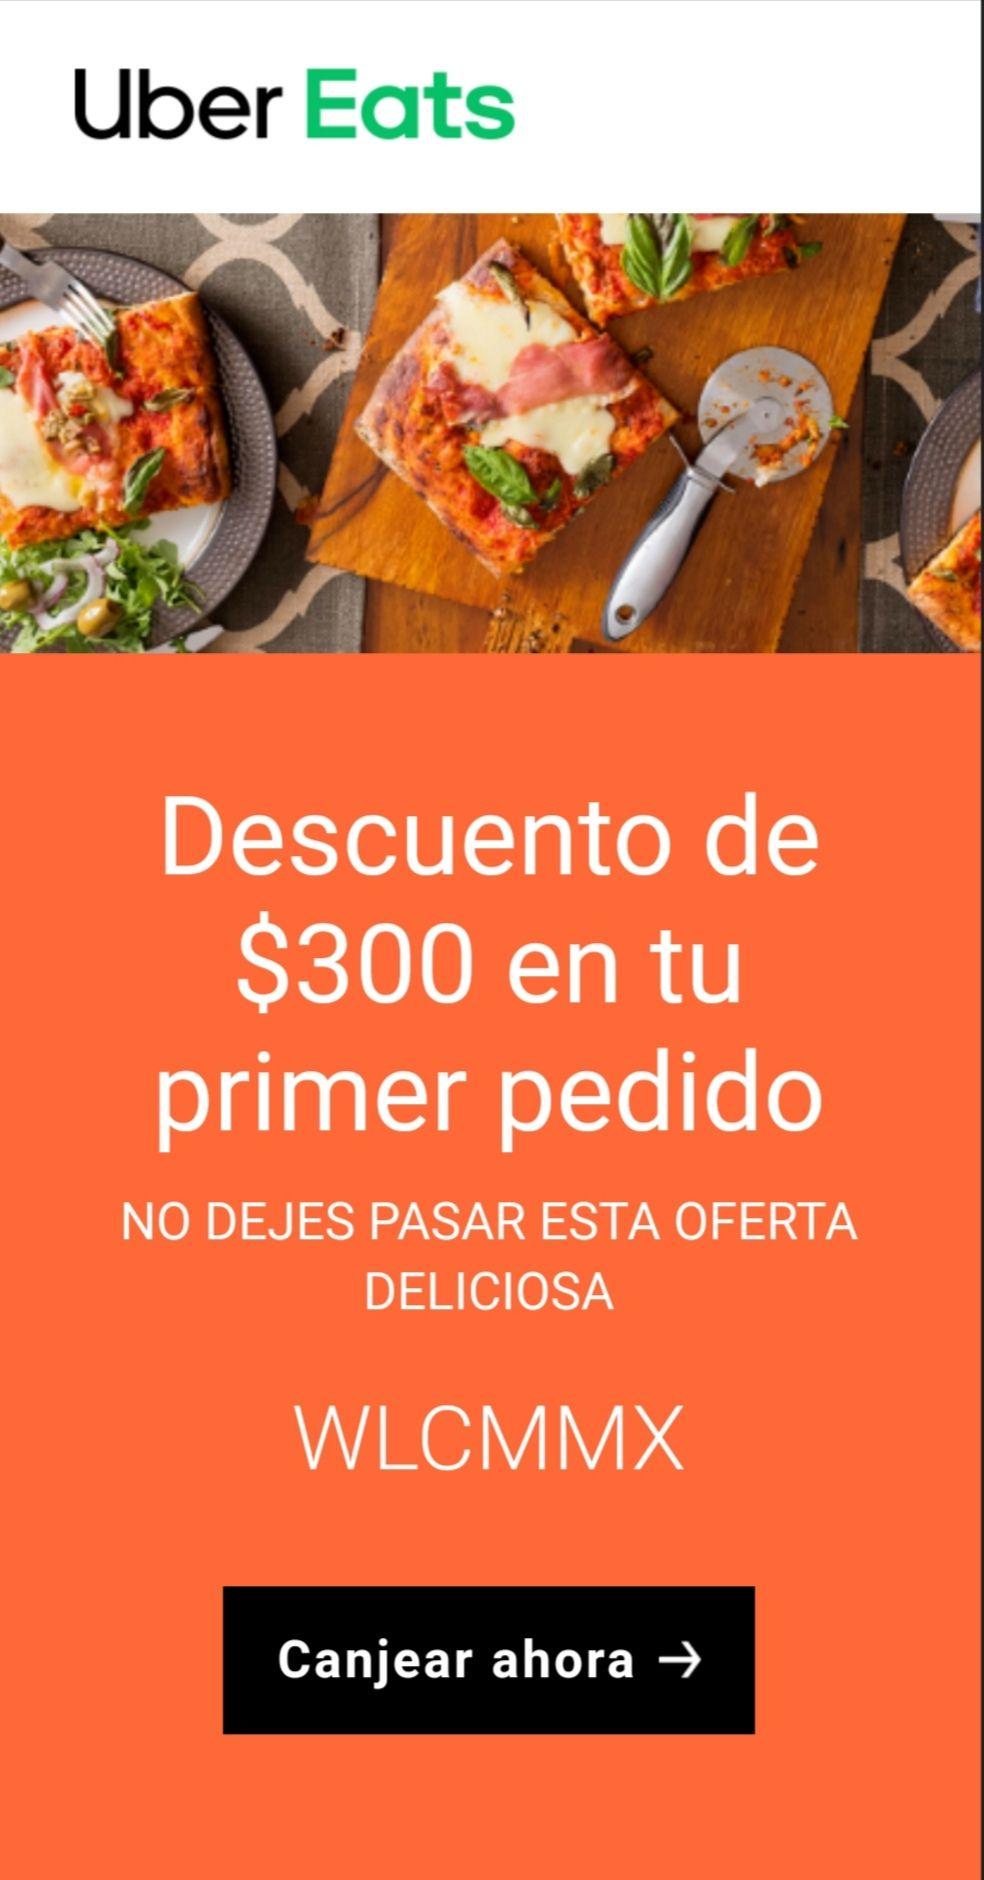 Uber Eats: Descuento $300 en primer pedido